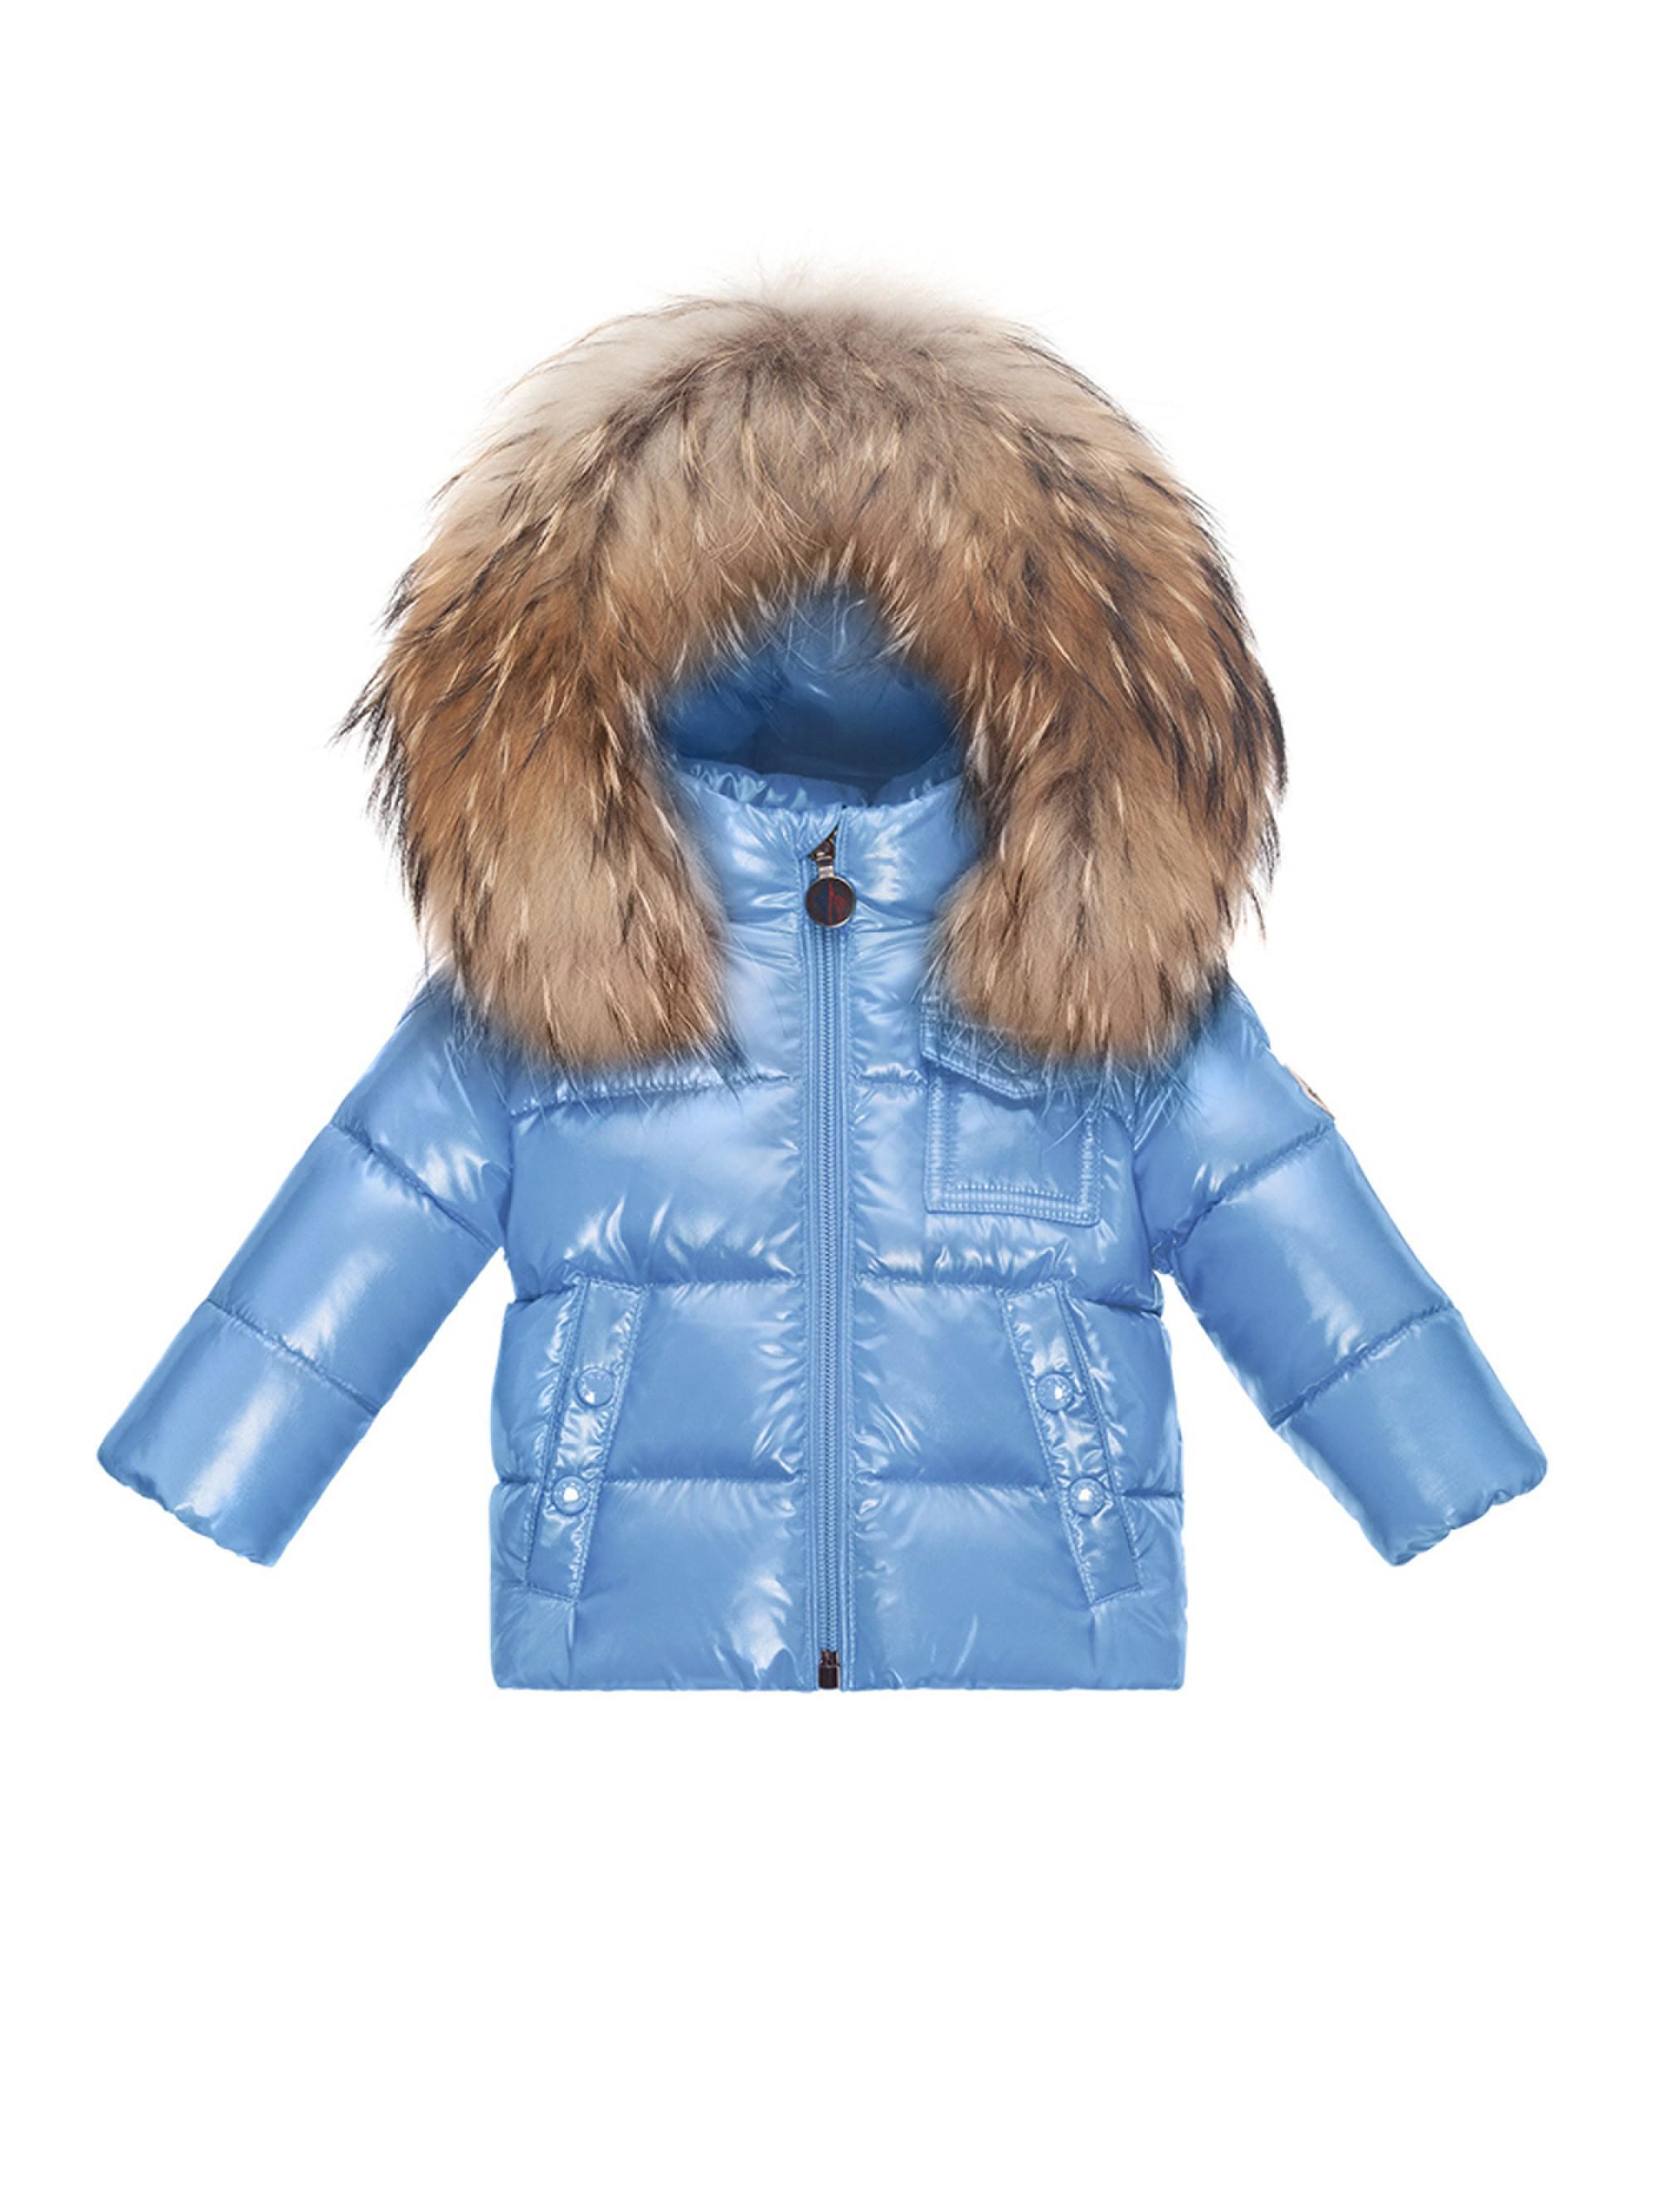 4221ba8be Moncler Baby Boy's Fur-trim Puffer Jacket in Blue - Lyst